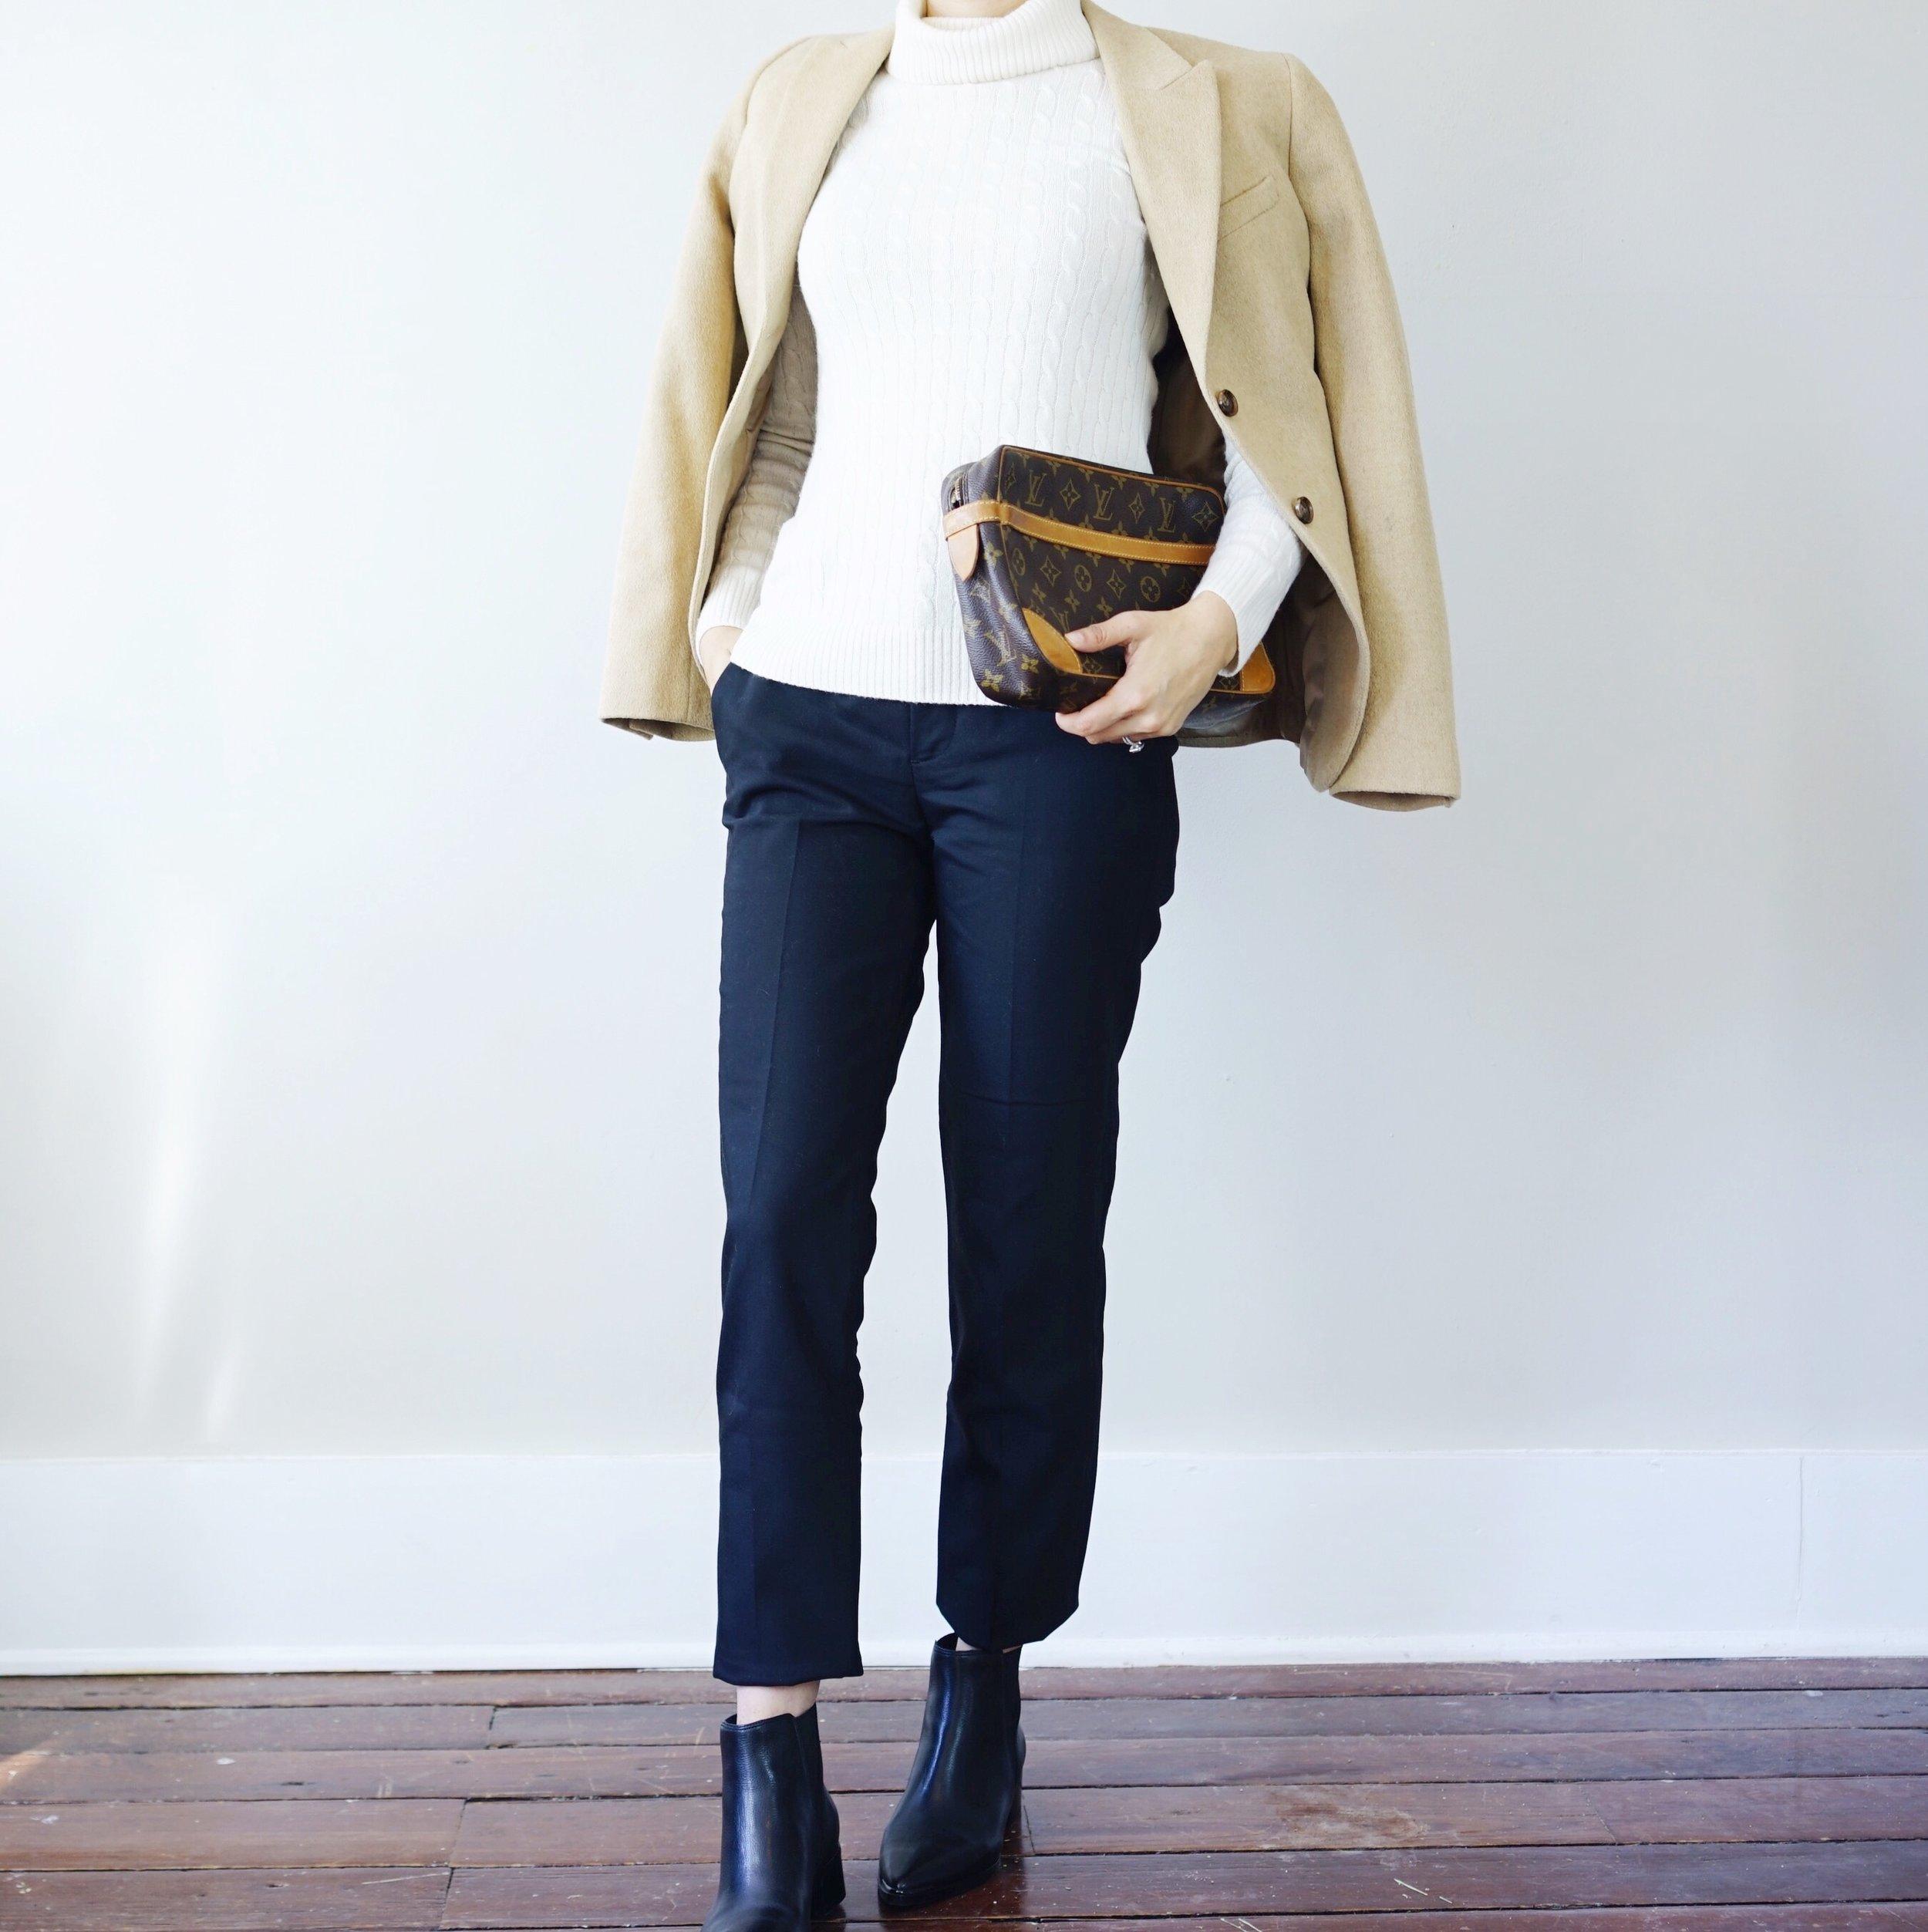 jcrew-cashmere-turtleneck-zara-pants-marc-fisher-yale-booties-louis-vuitton-clutch-brooks-brothers-camel-blazer.jpg